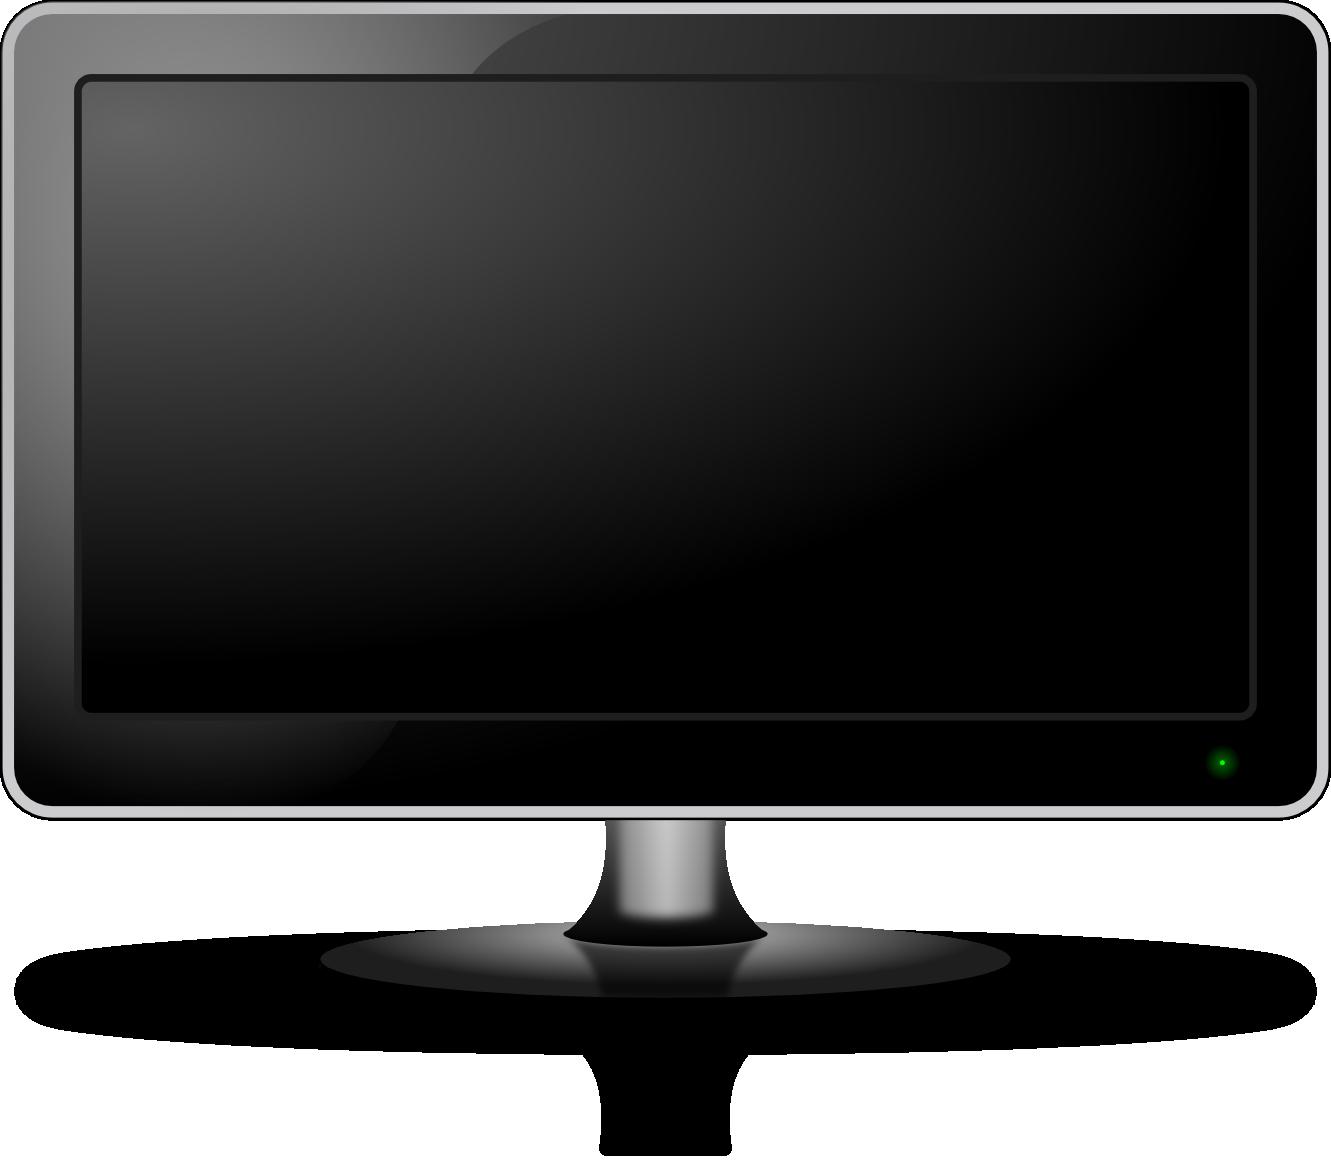 Computer clipart computer screen, Computer computer screen.